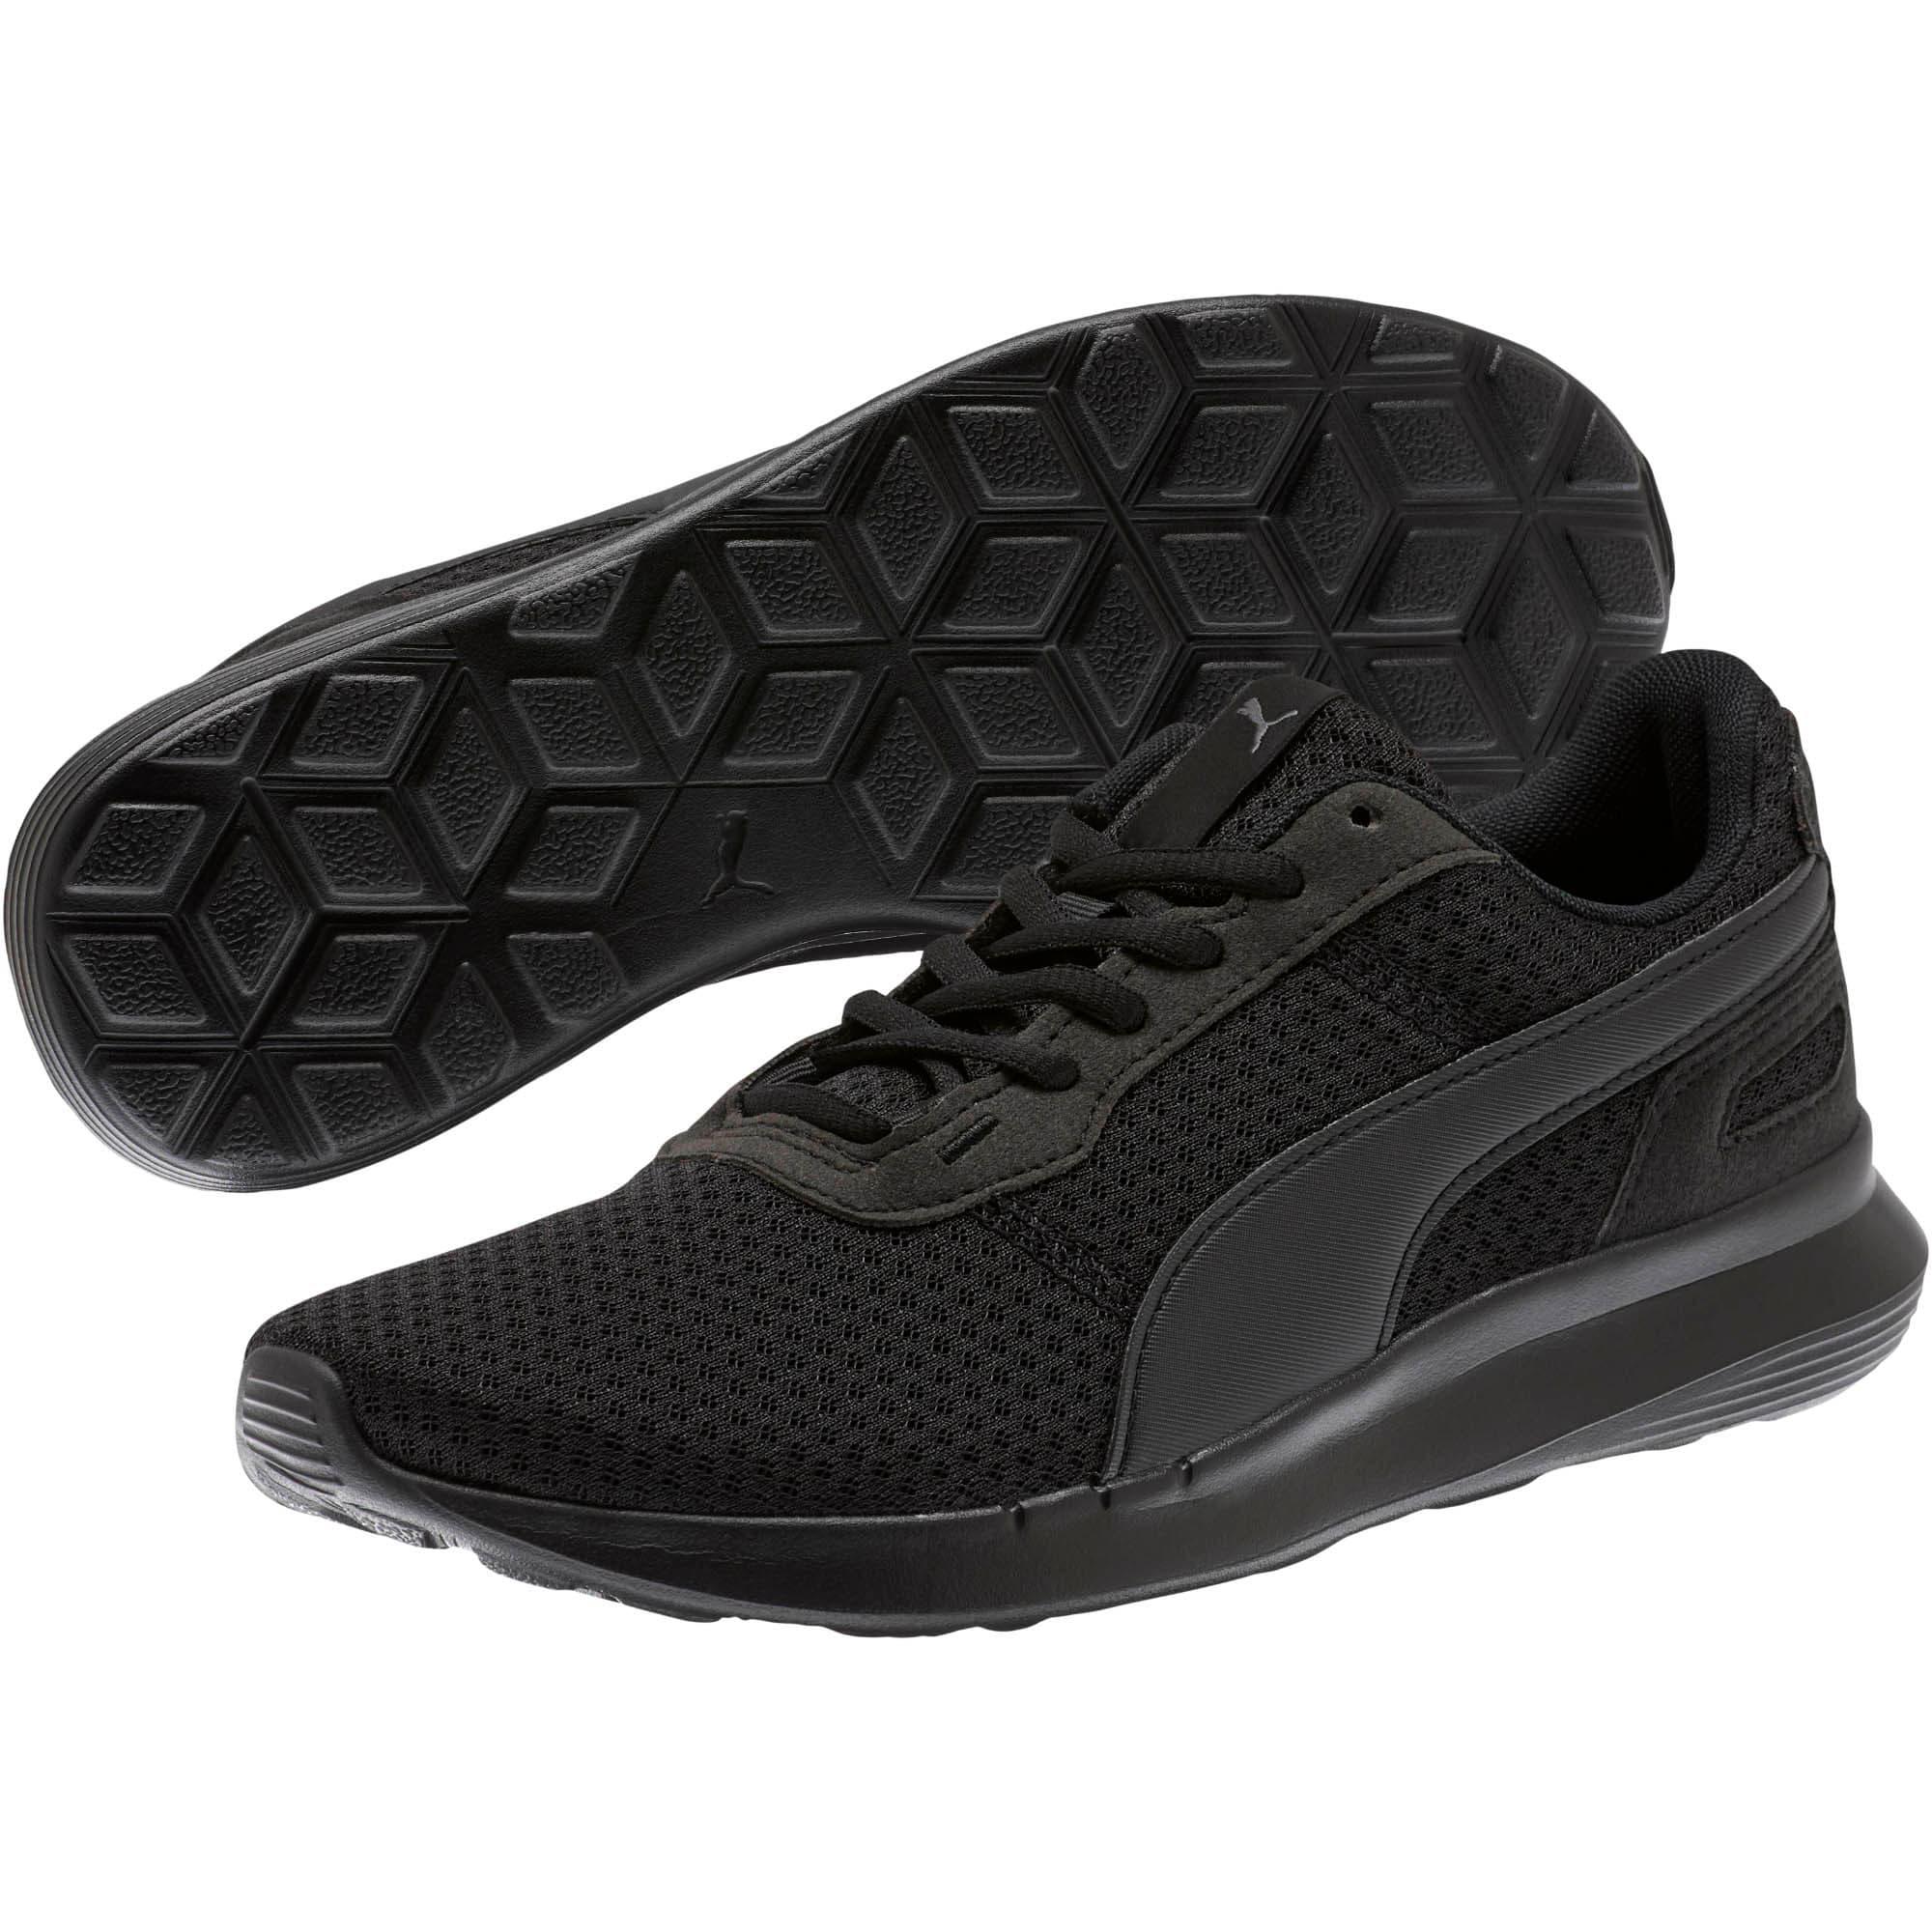 Thumbnail 2 of ST Activate Women's Sneakers, Puma Black-Puma Black, medium